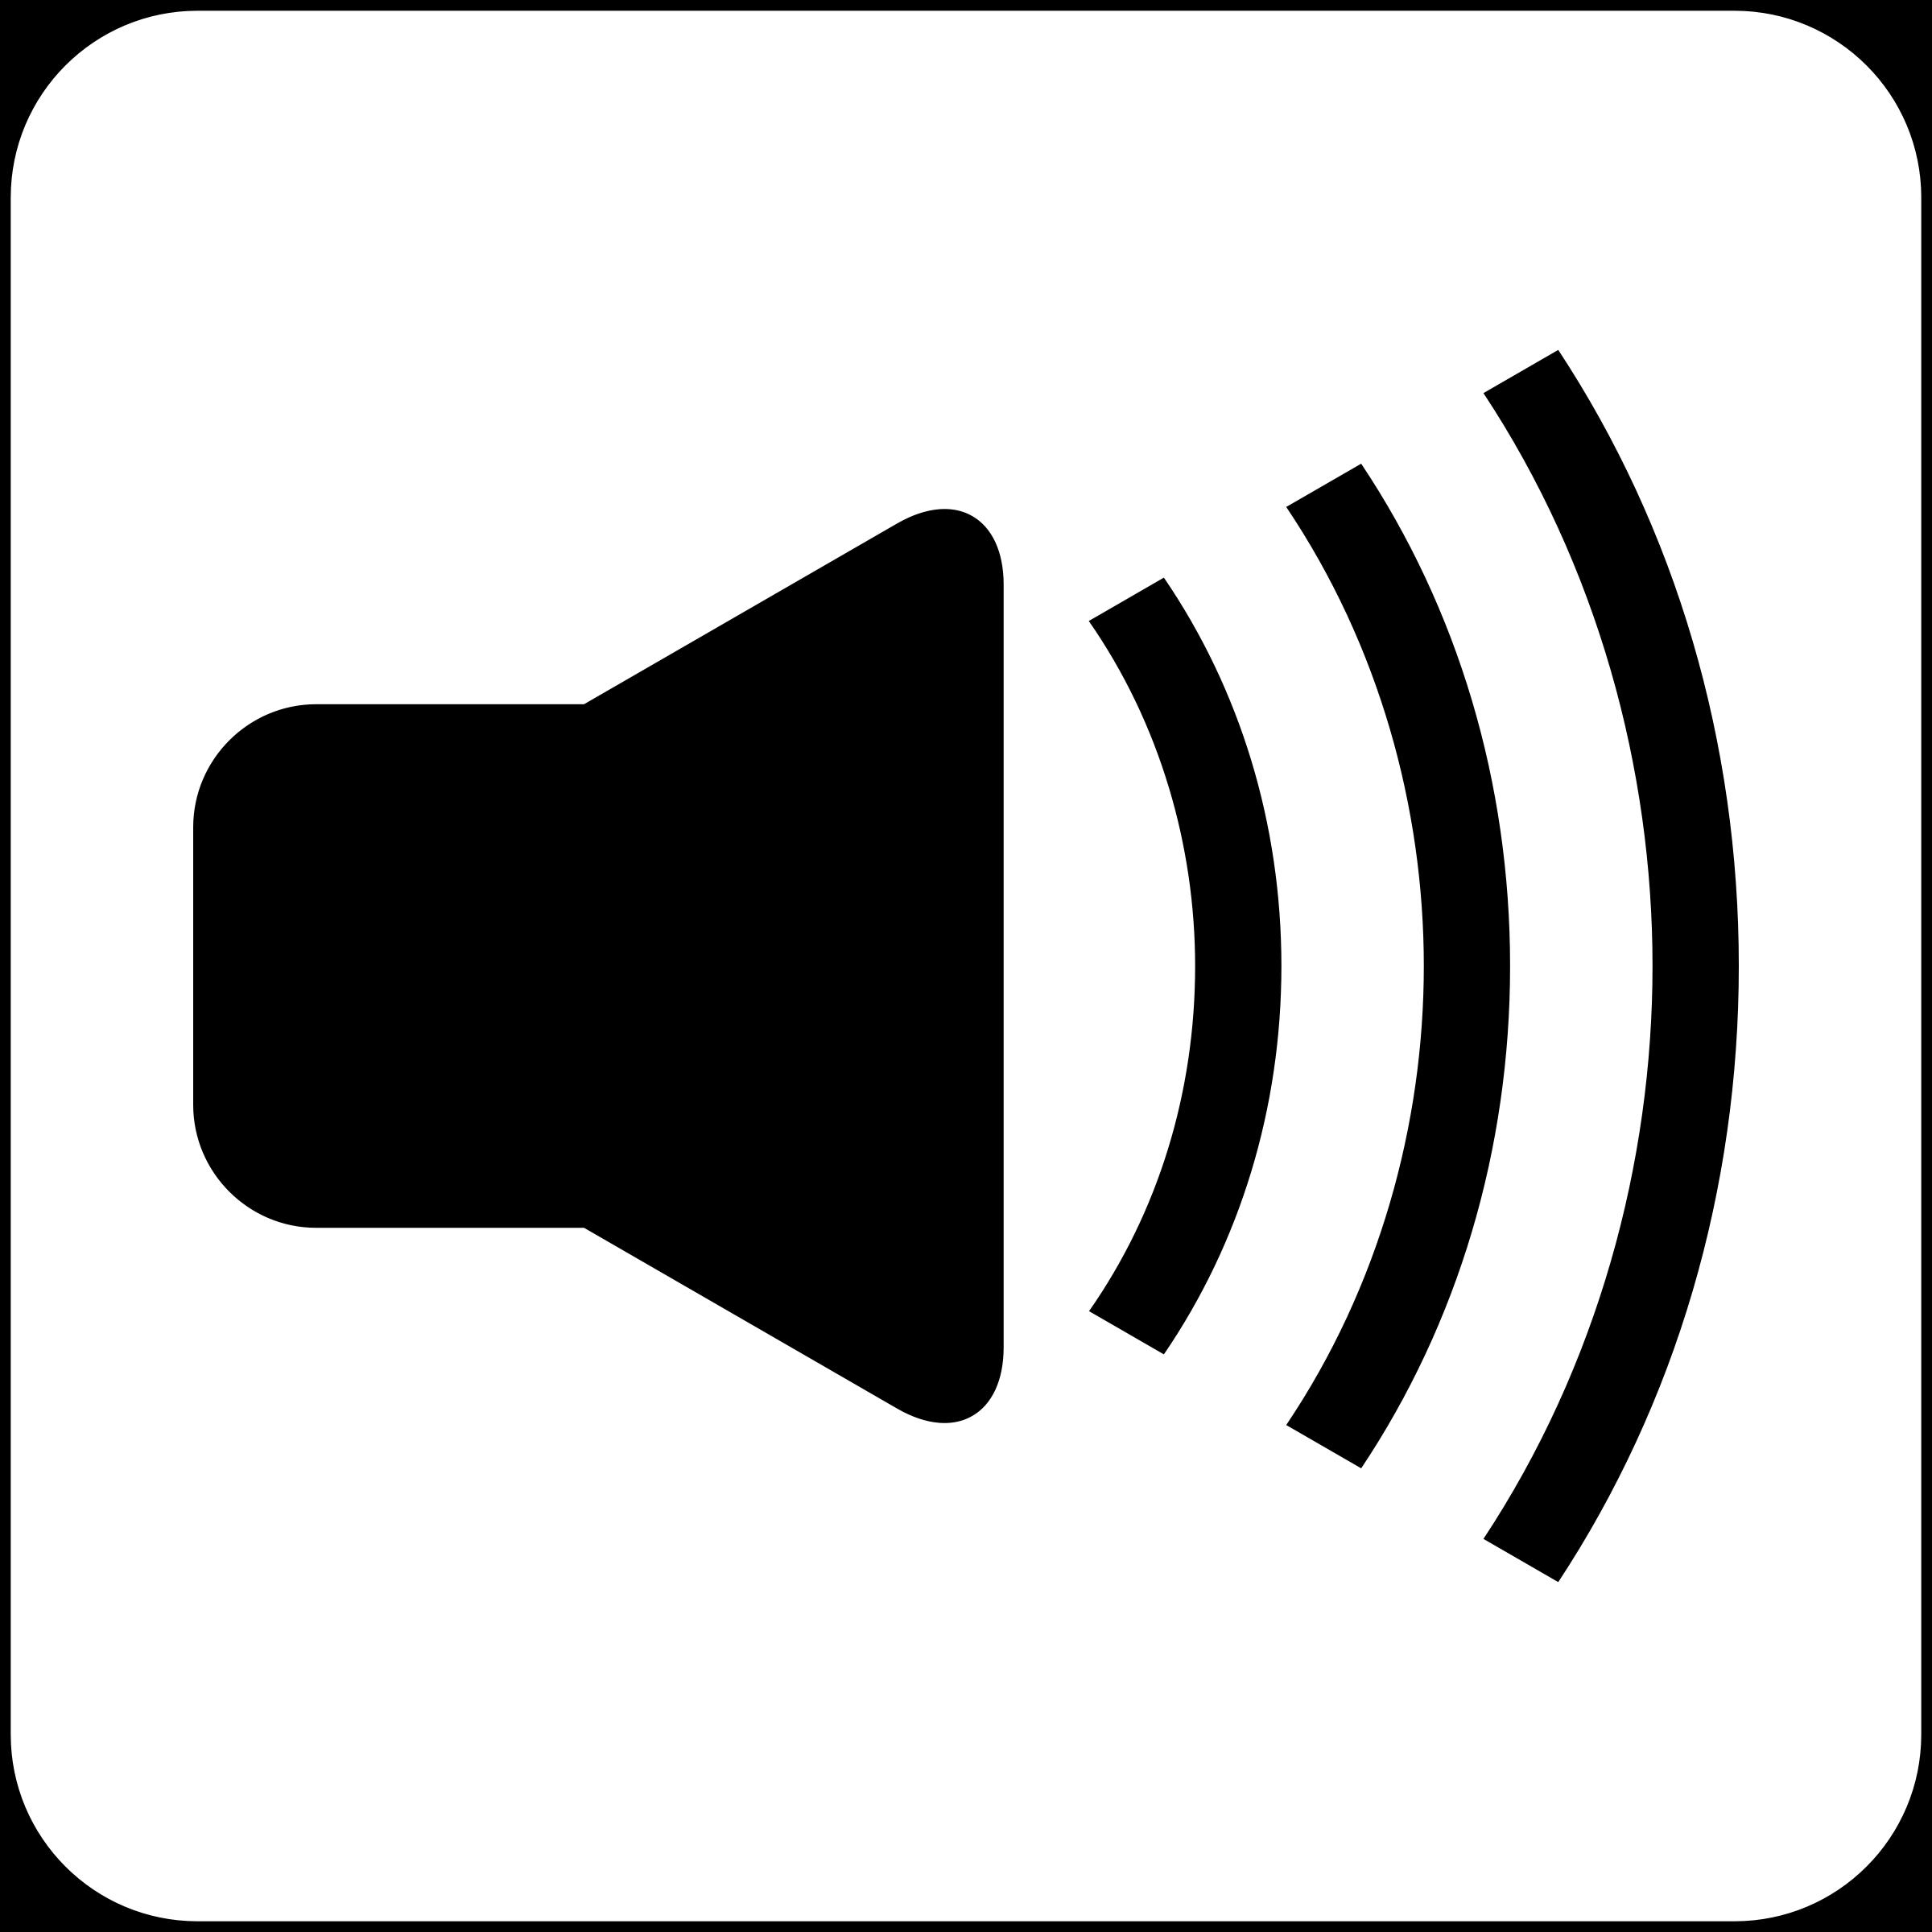 2400x2400 Clipart Symbols Sound